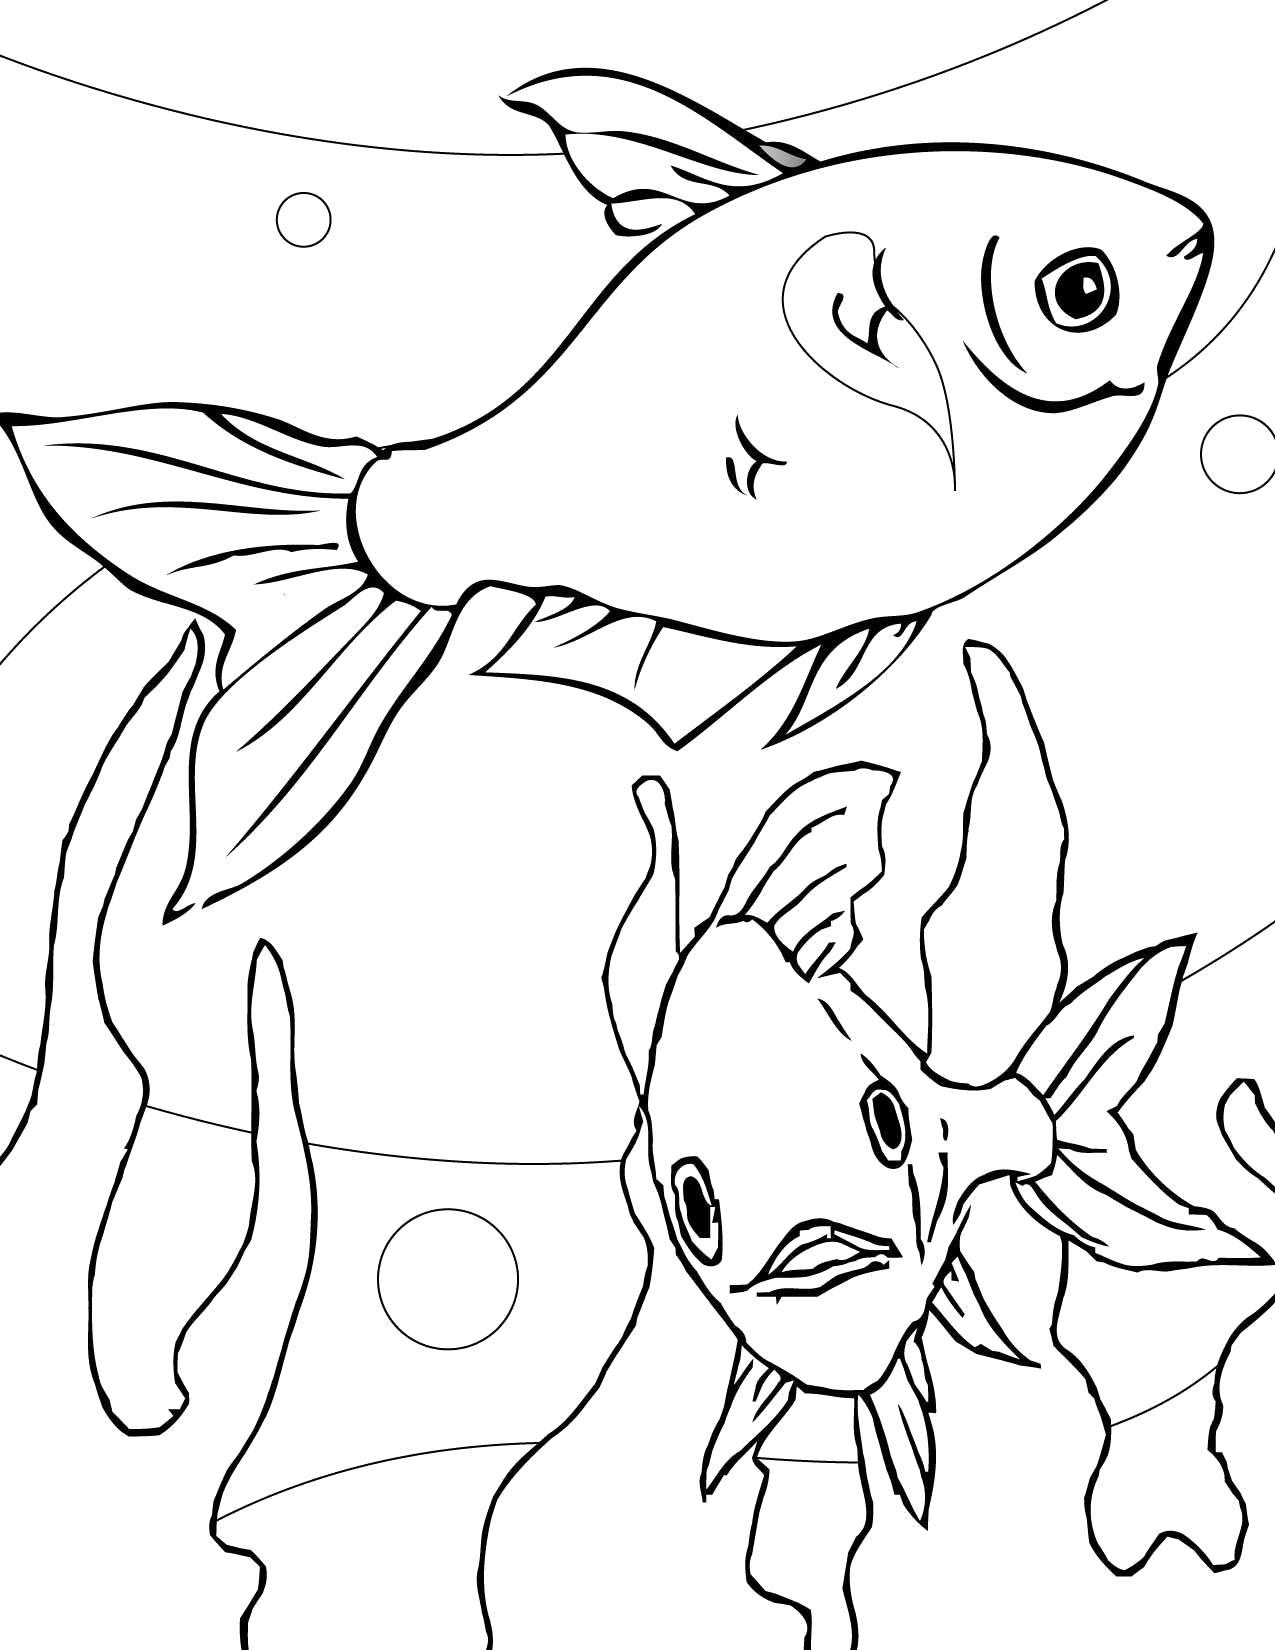 Название: Раскраска Золотые рыбки. Категория: рыба. Теги: рыба.